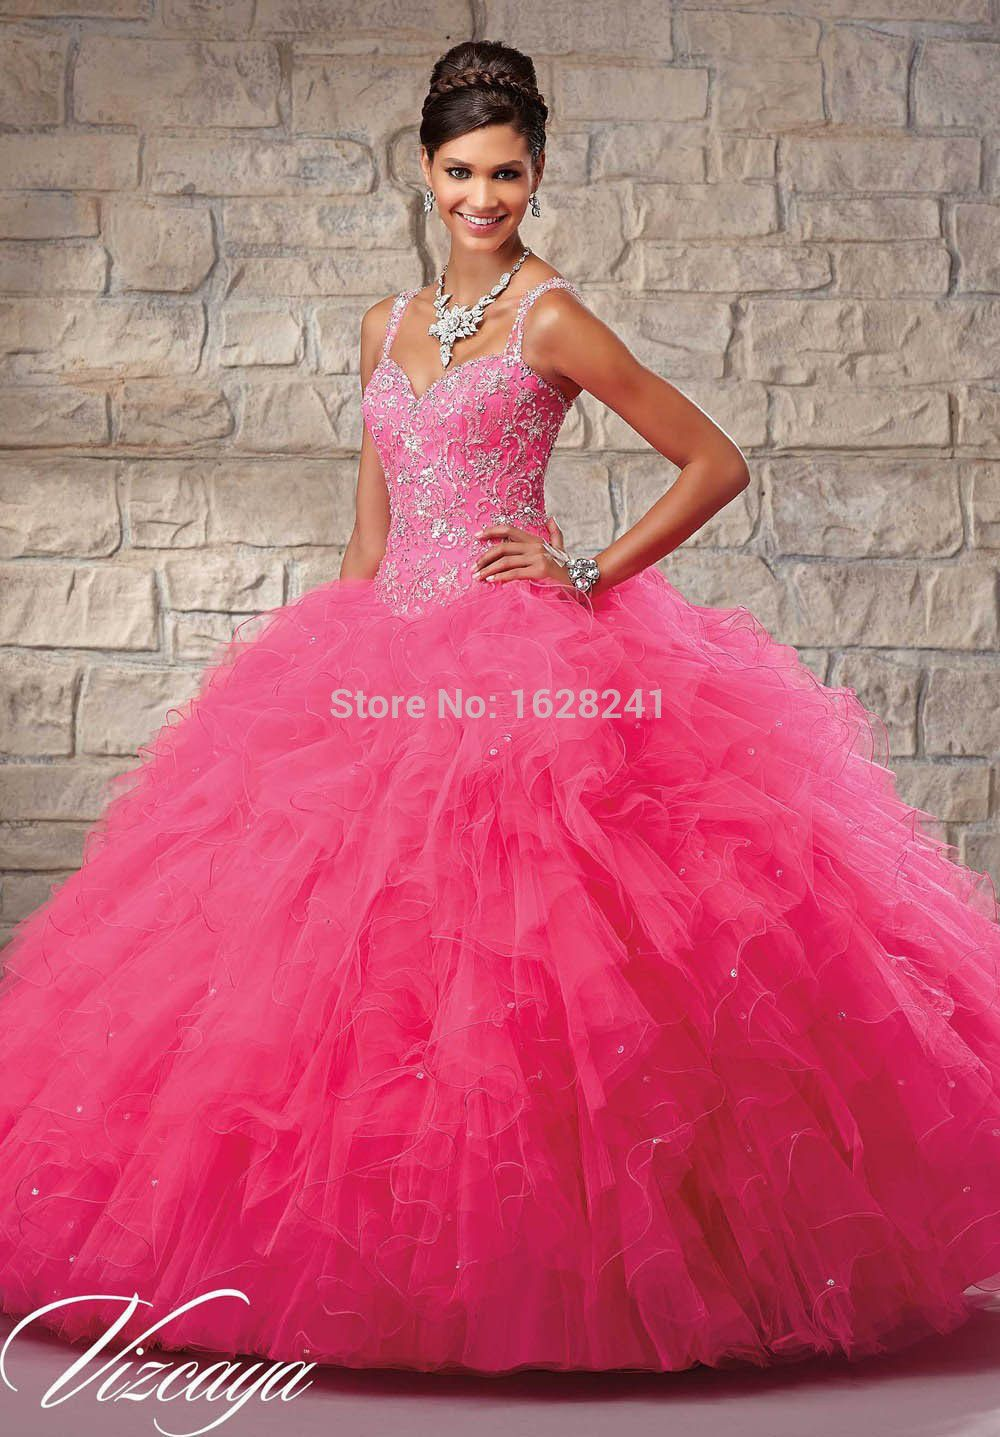 Find More Quinceanera Dresses Information about vestido debutante 15 ...